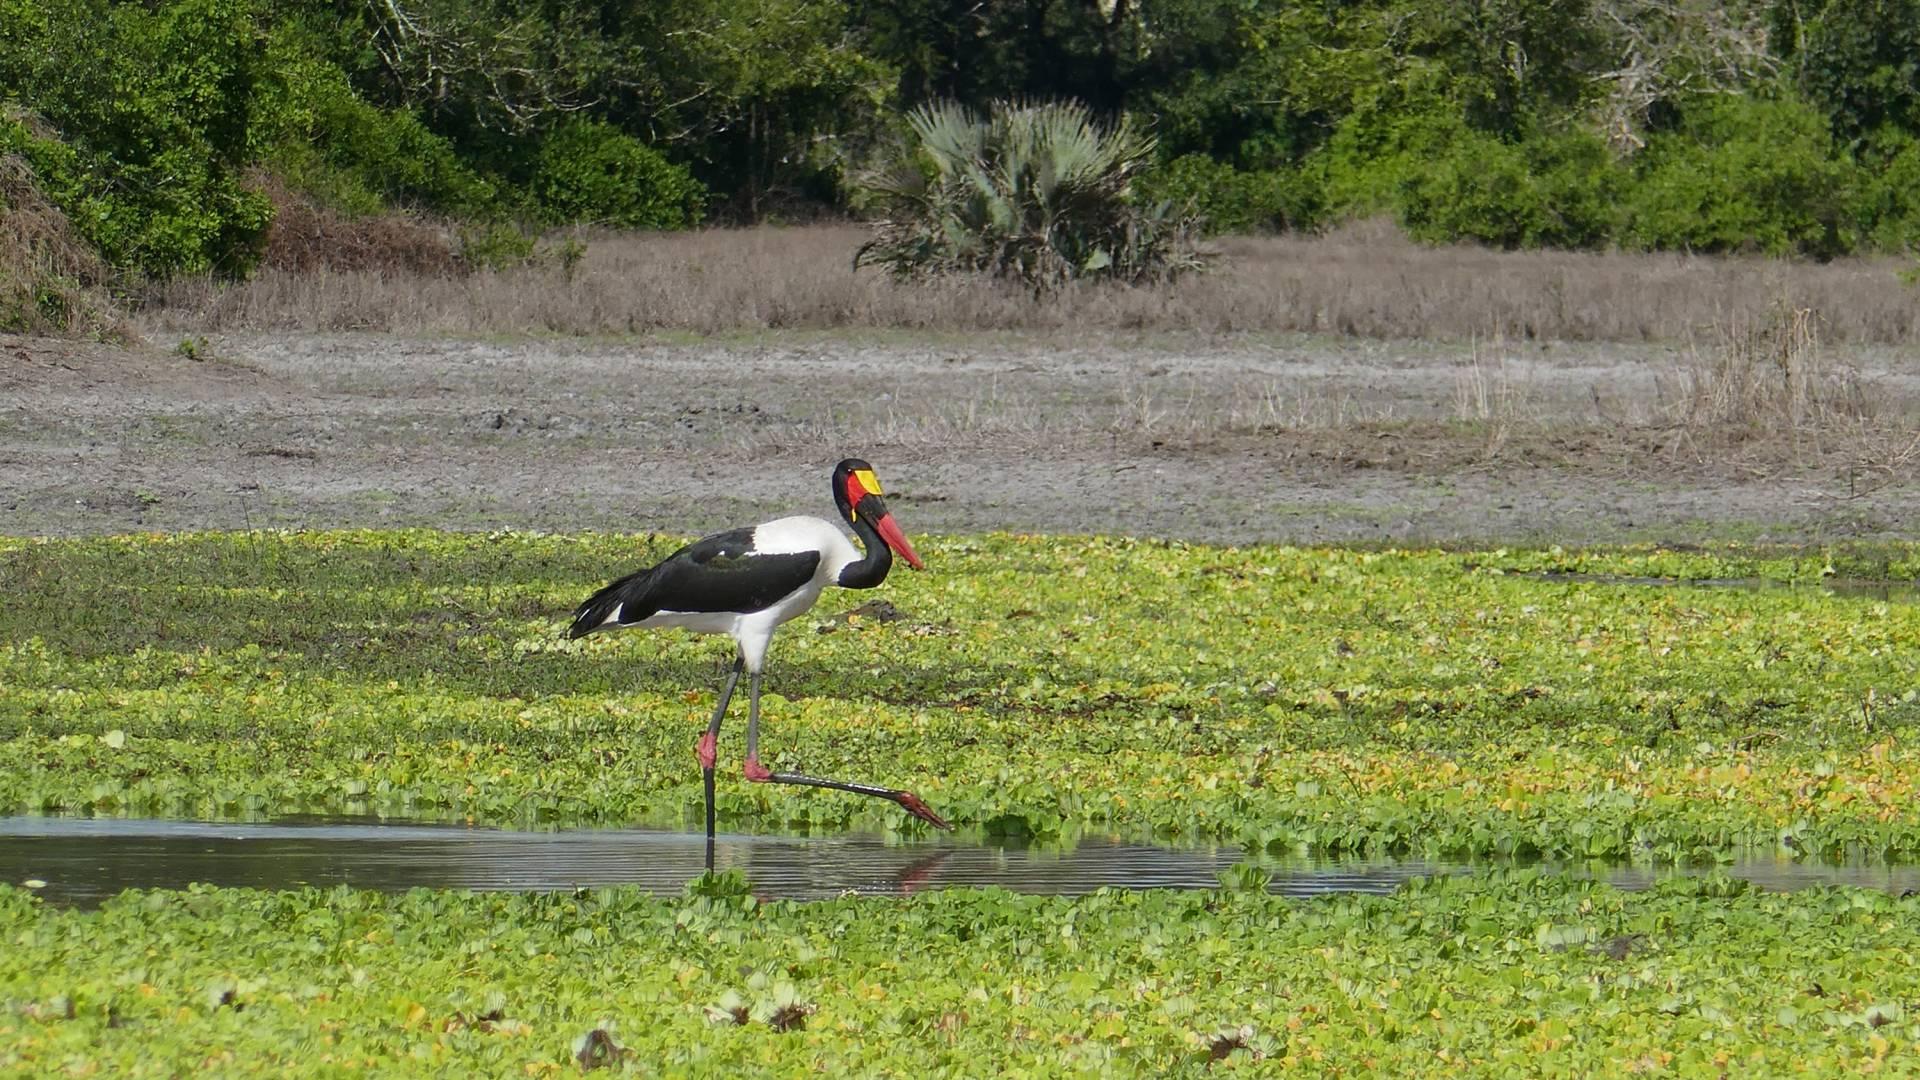 A saddle-billed stork stands in a pond